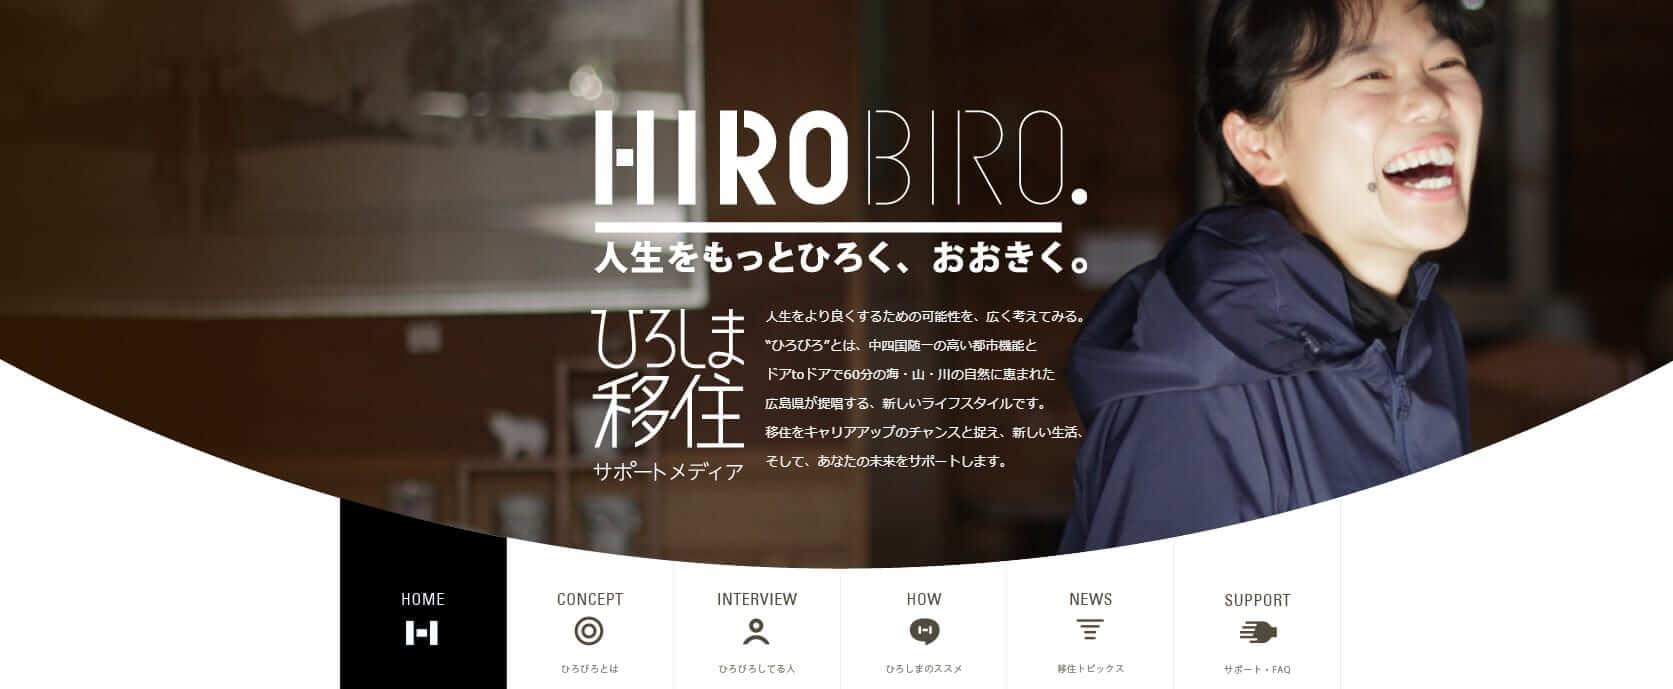 HIROBIRO(広島移住サポートメディア)